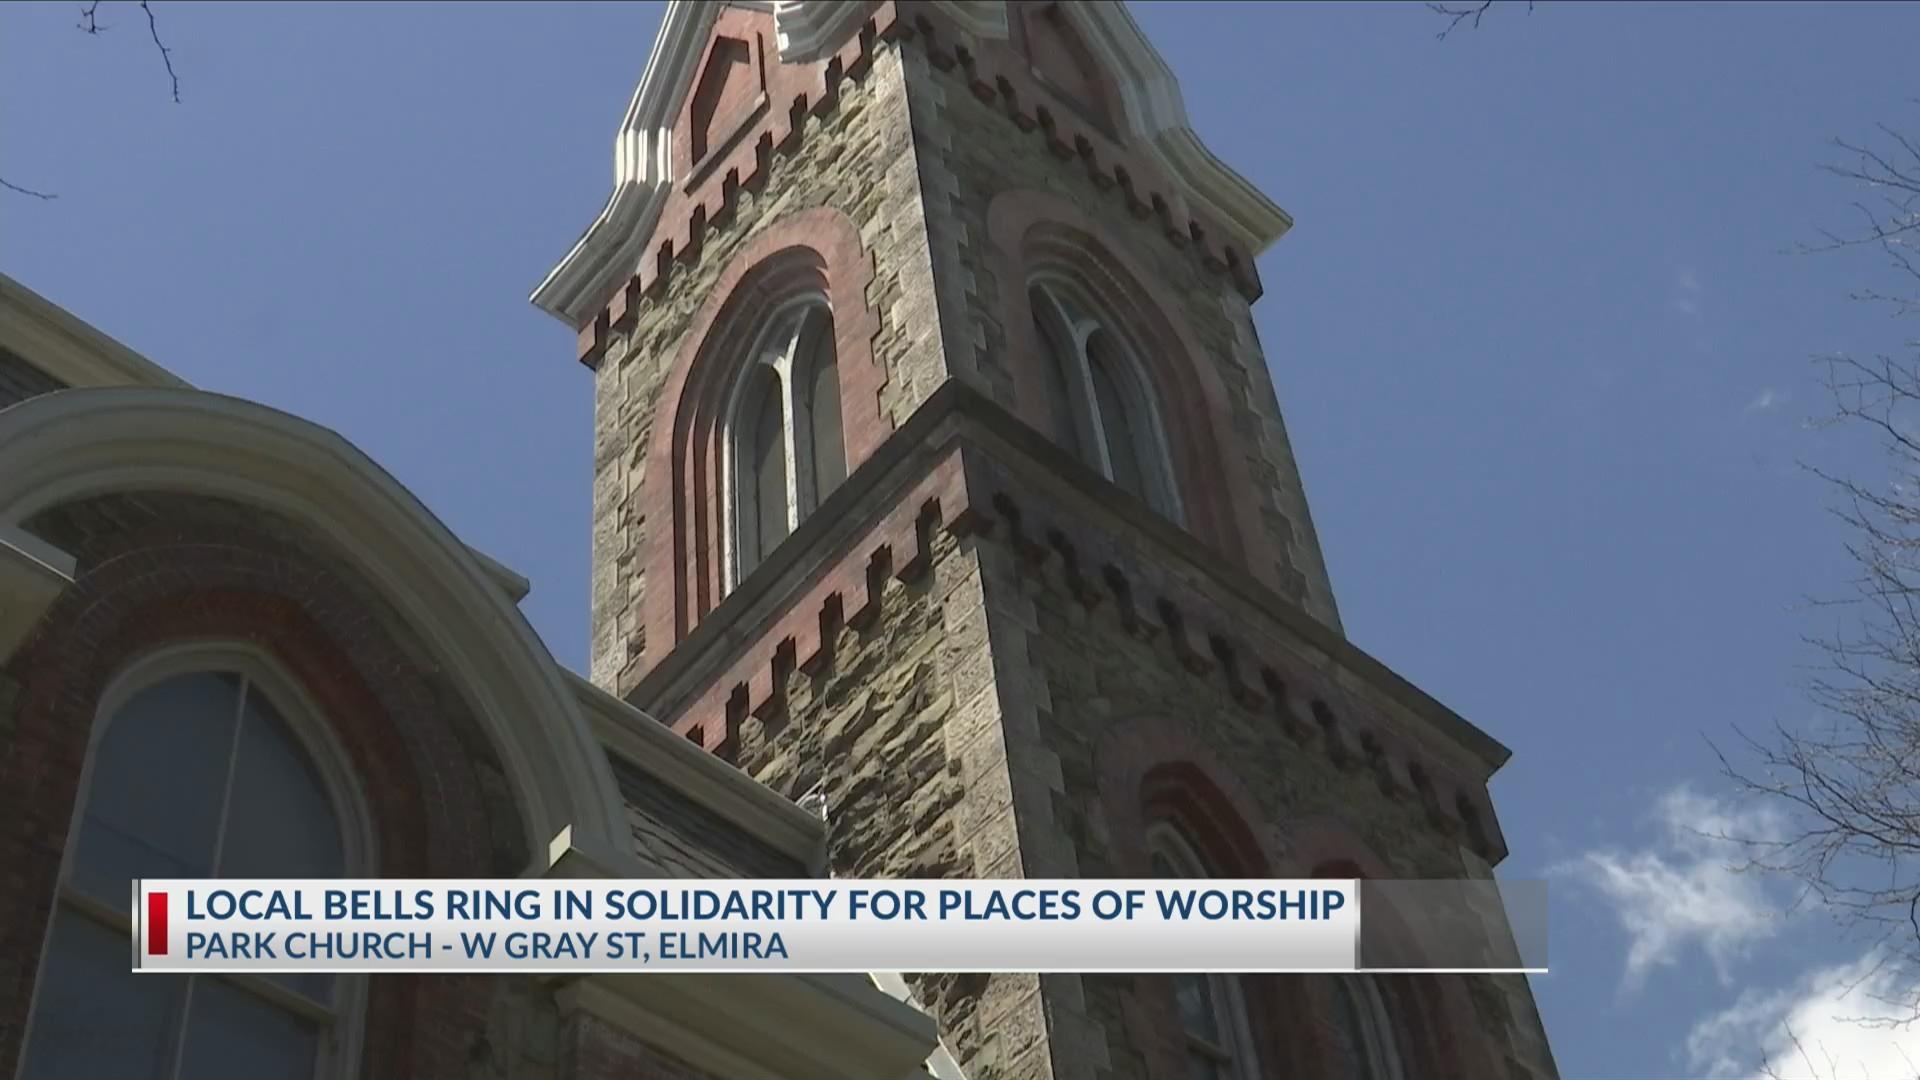 Local church bells toll